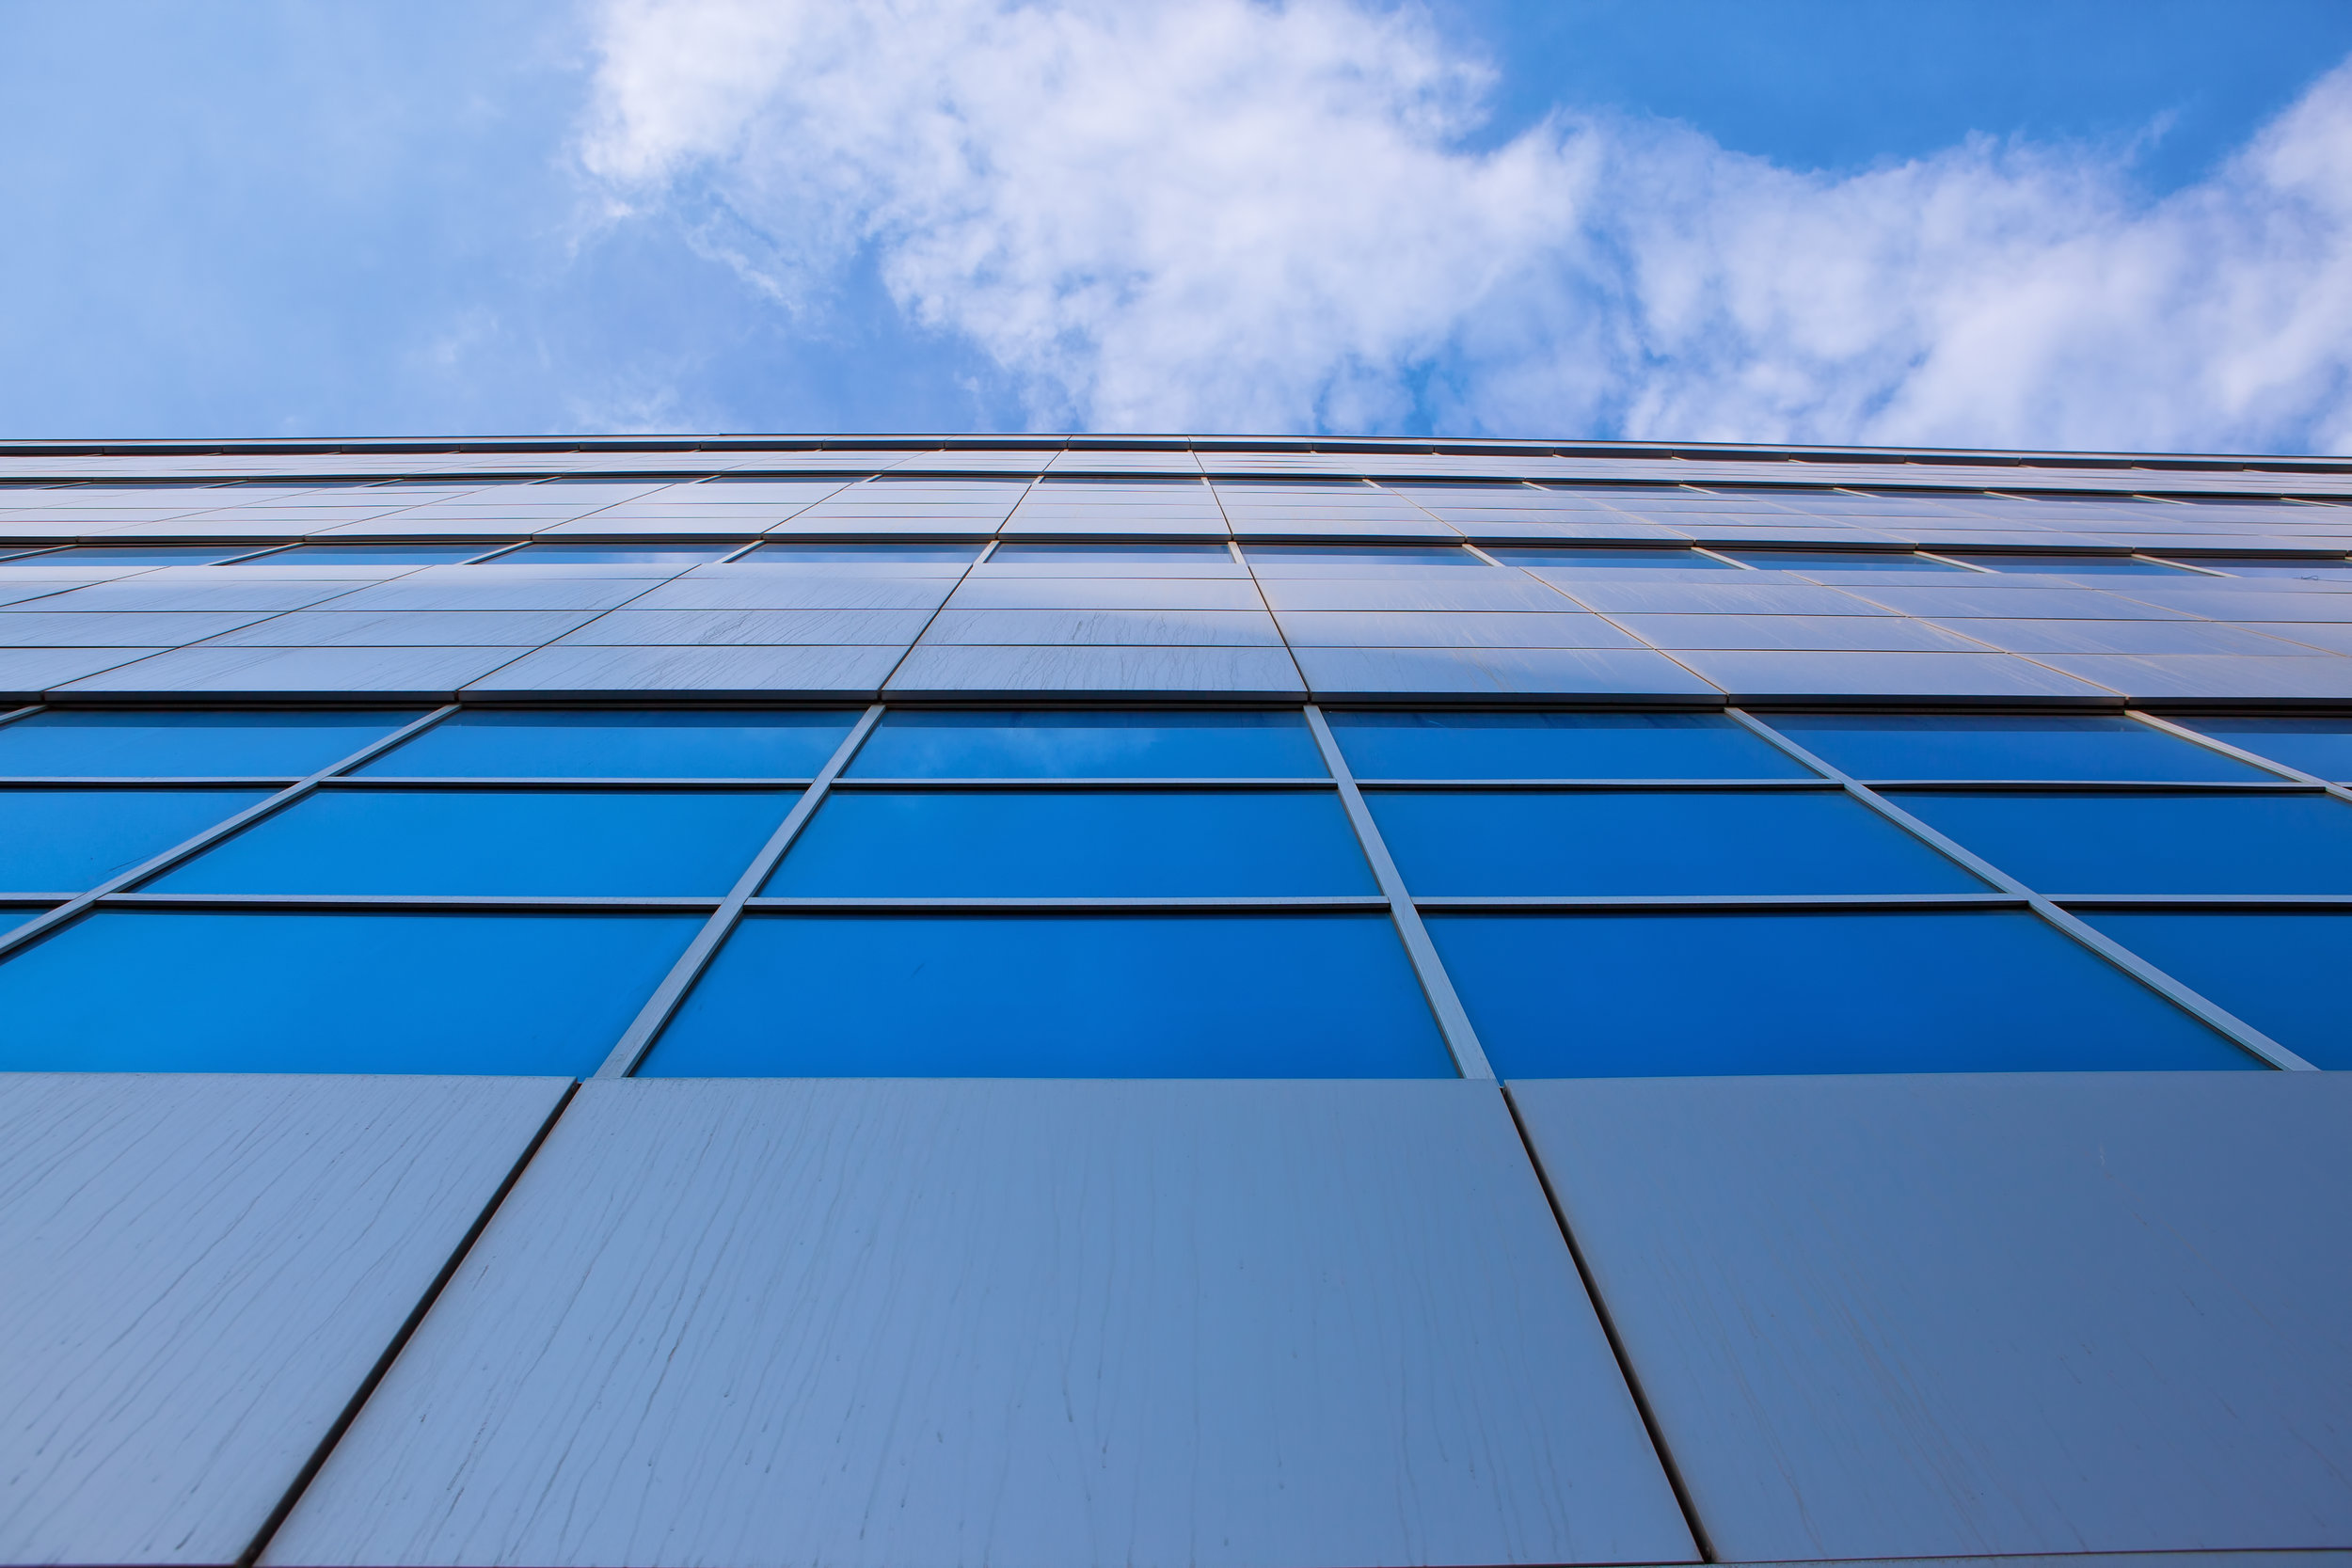 stockvault-building-and-blue-sky138892.jpg